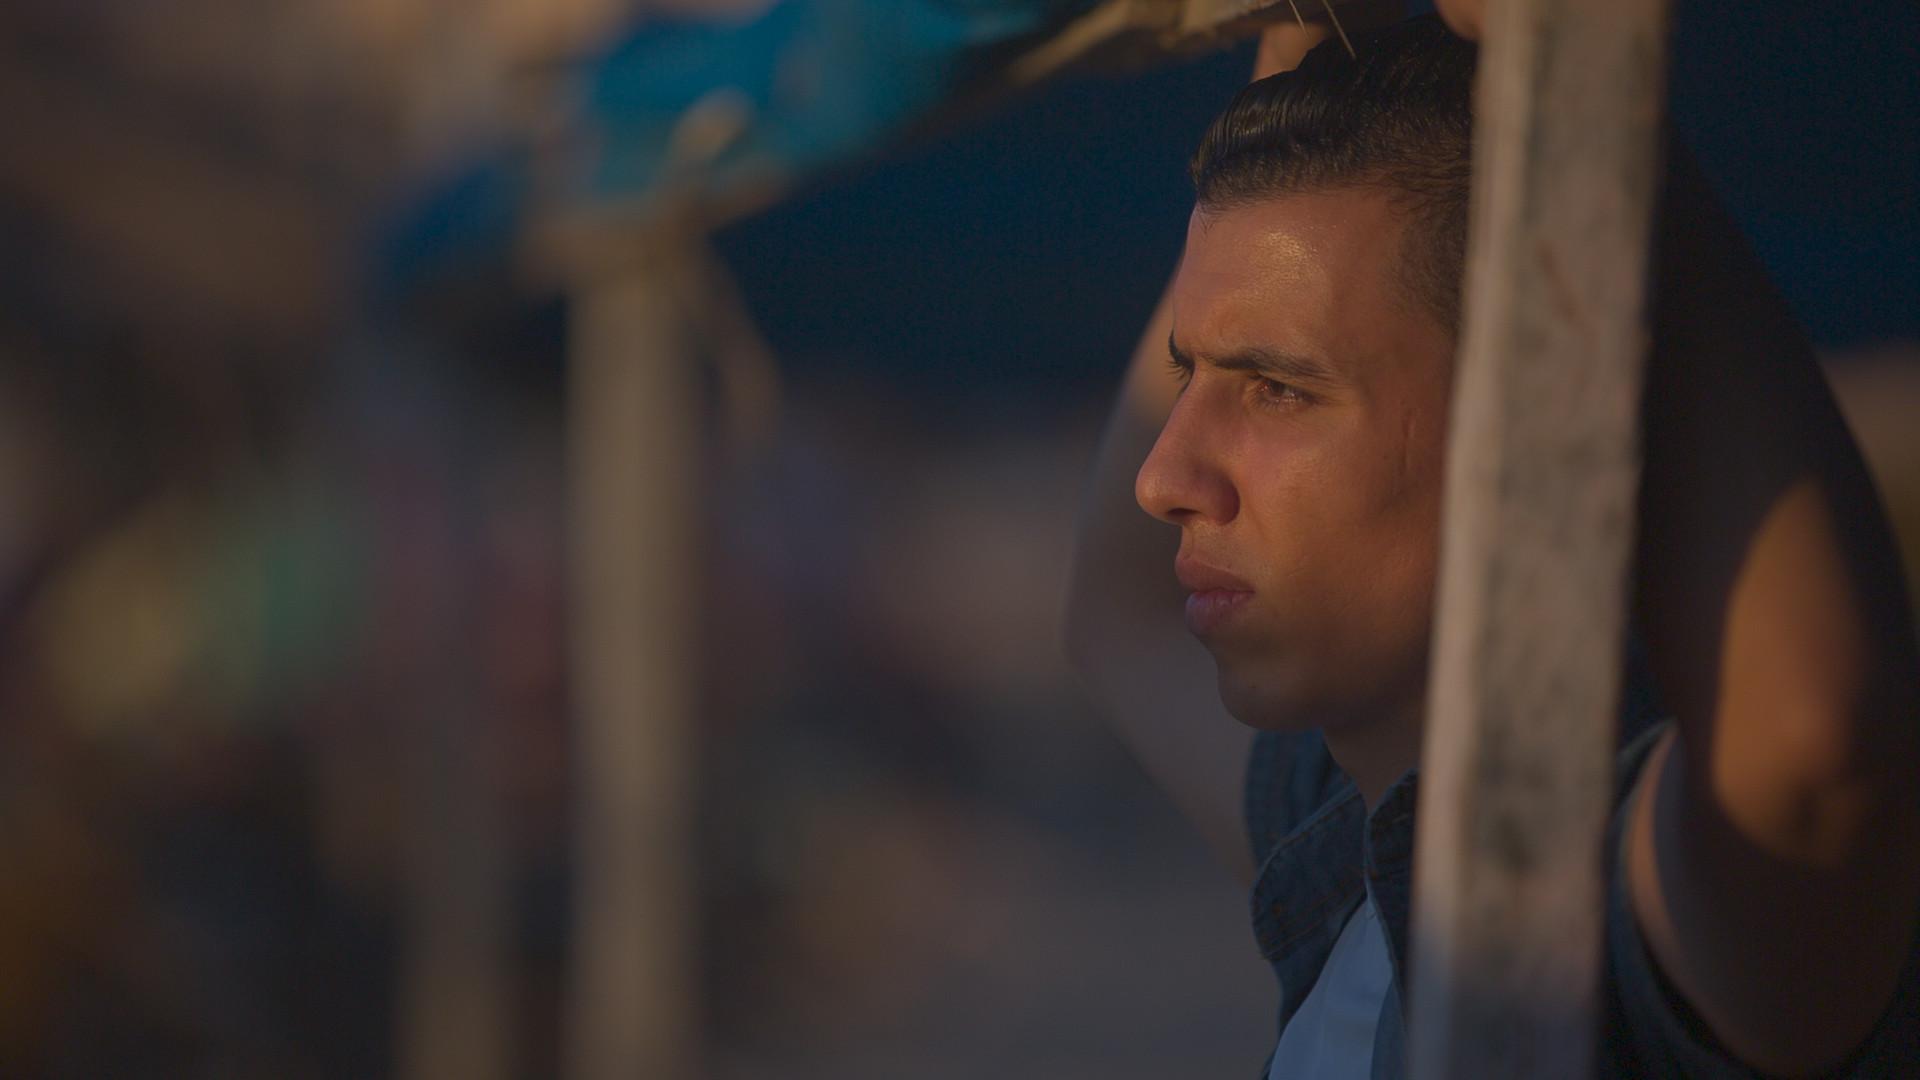 Photo 3 Gaza_Still_Alive_Film_Still_3